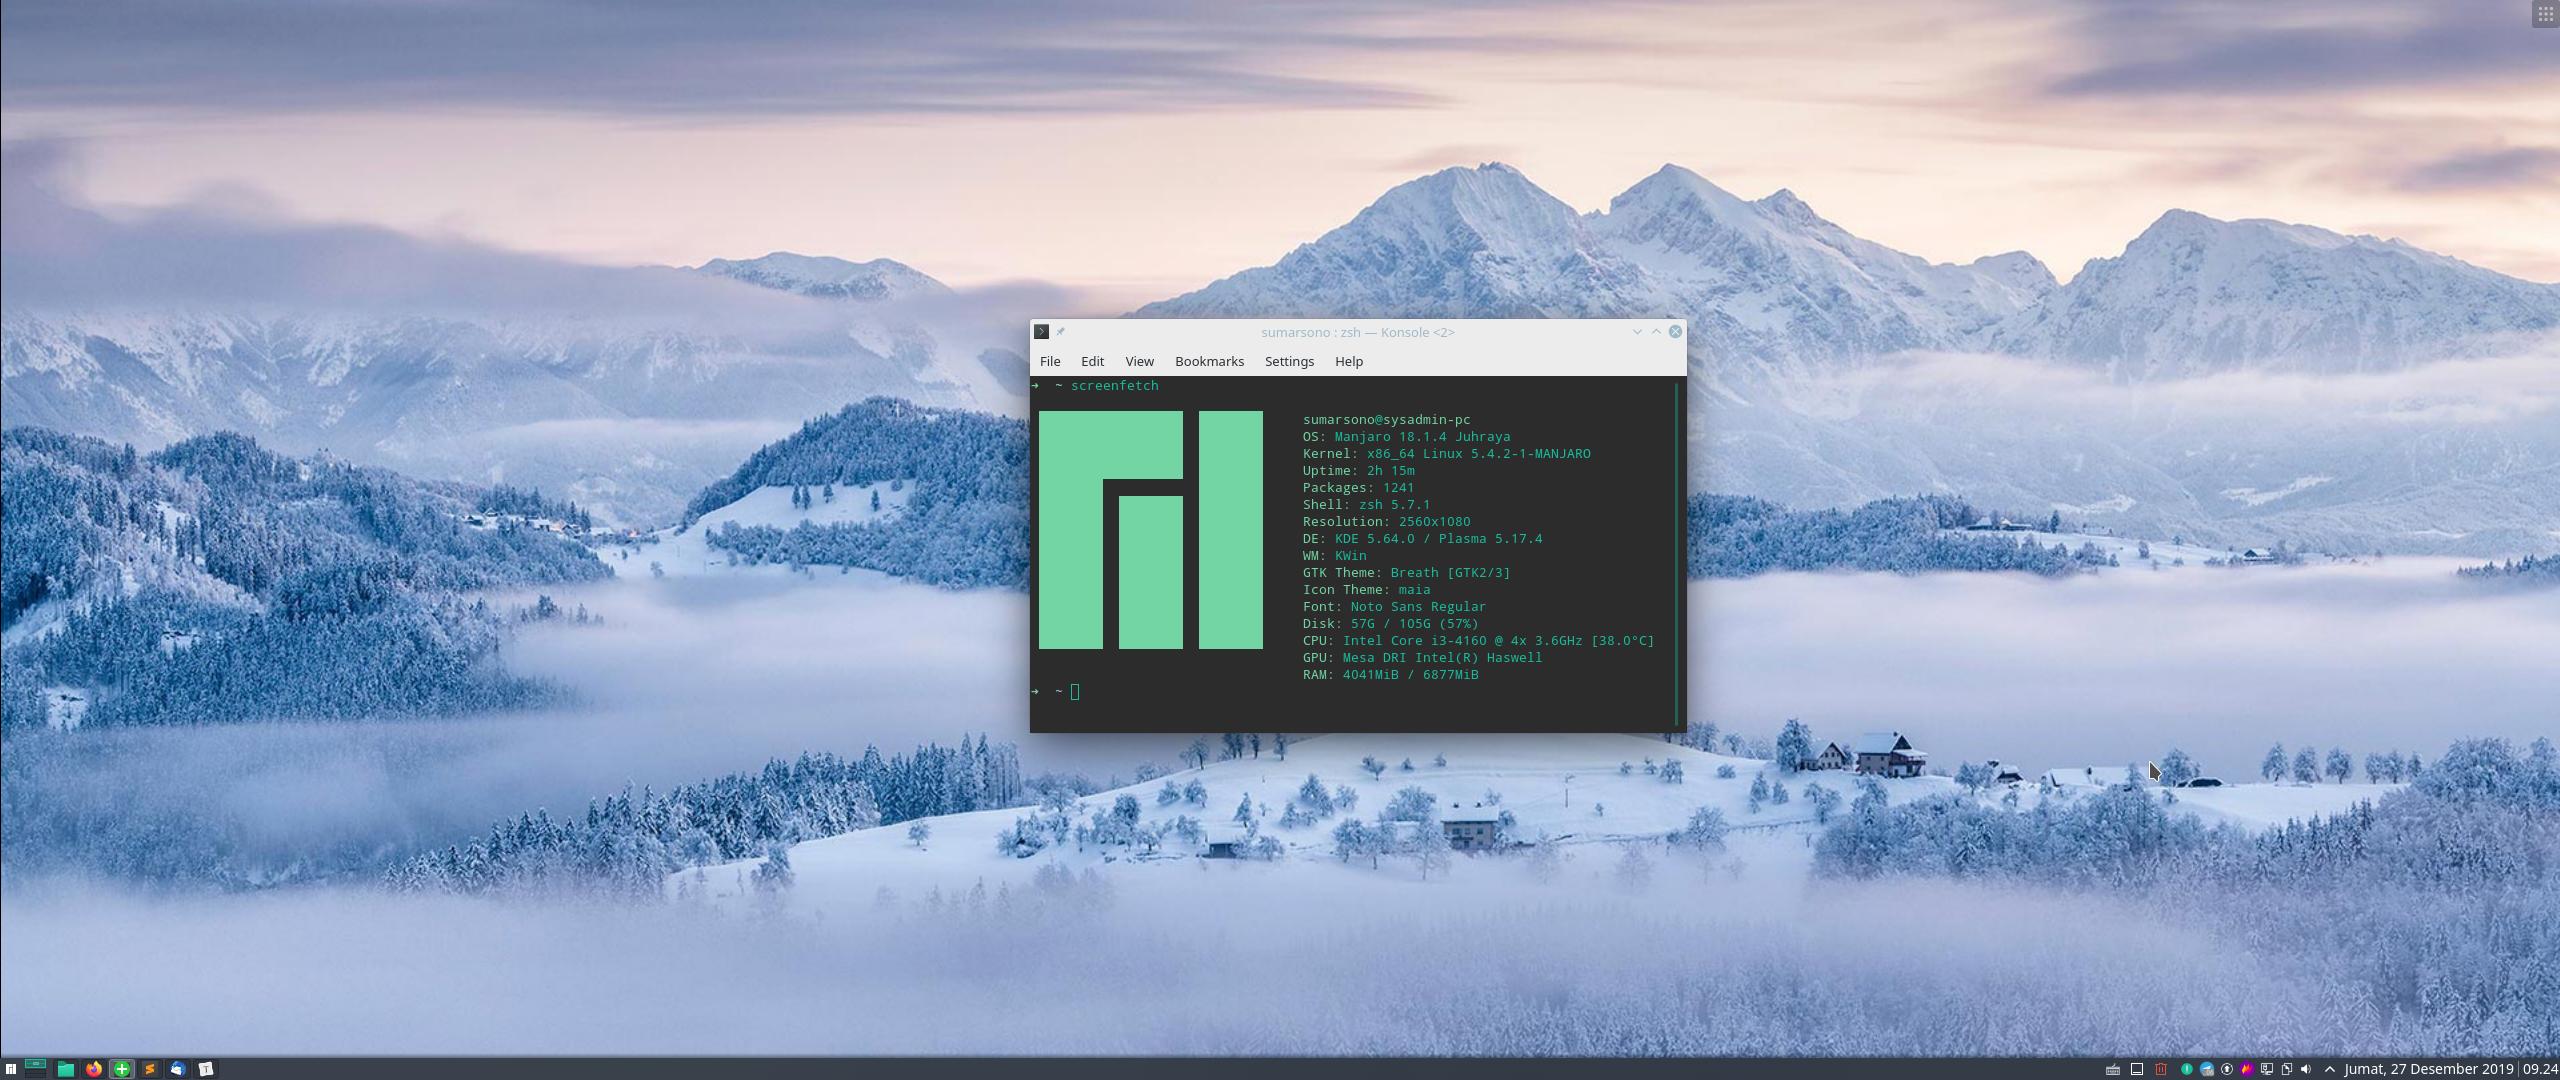 Desktopku